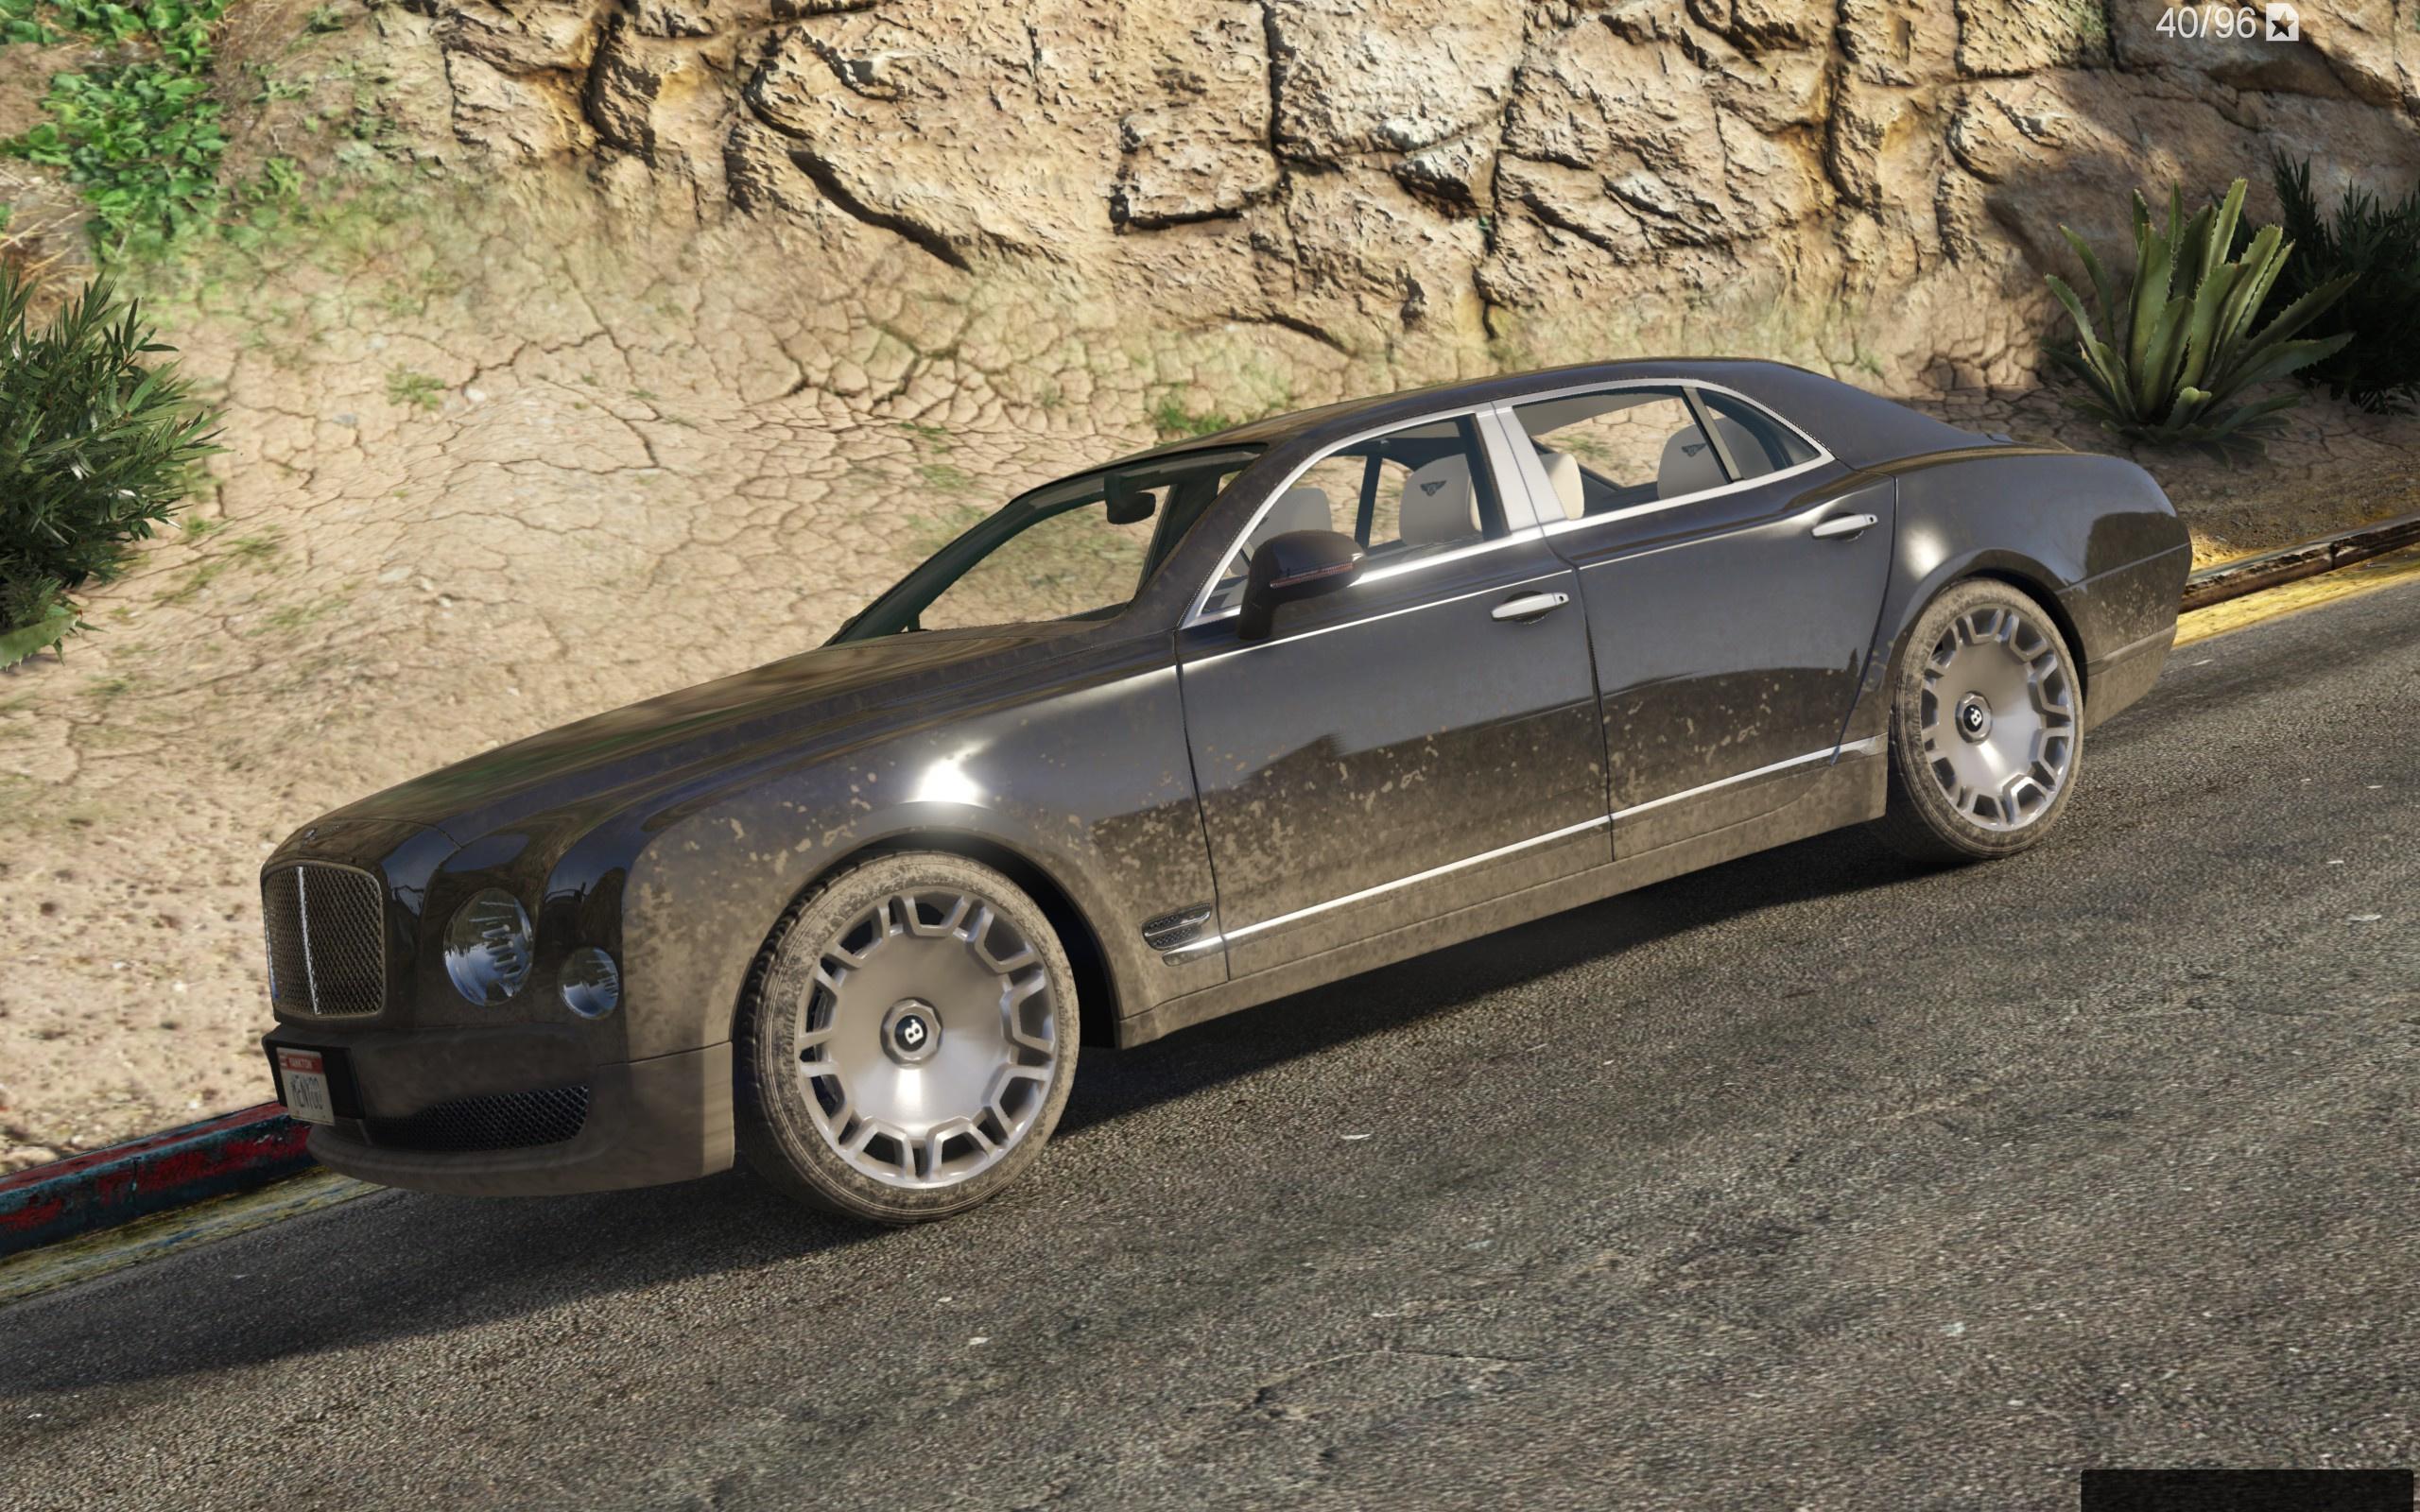 Bentley Mulsanne Mulliner 2013 [Add Replace] GTA5 Mods